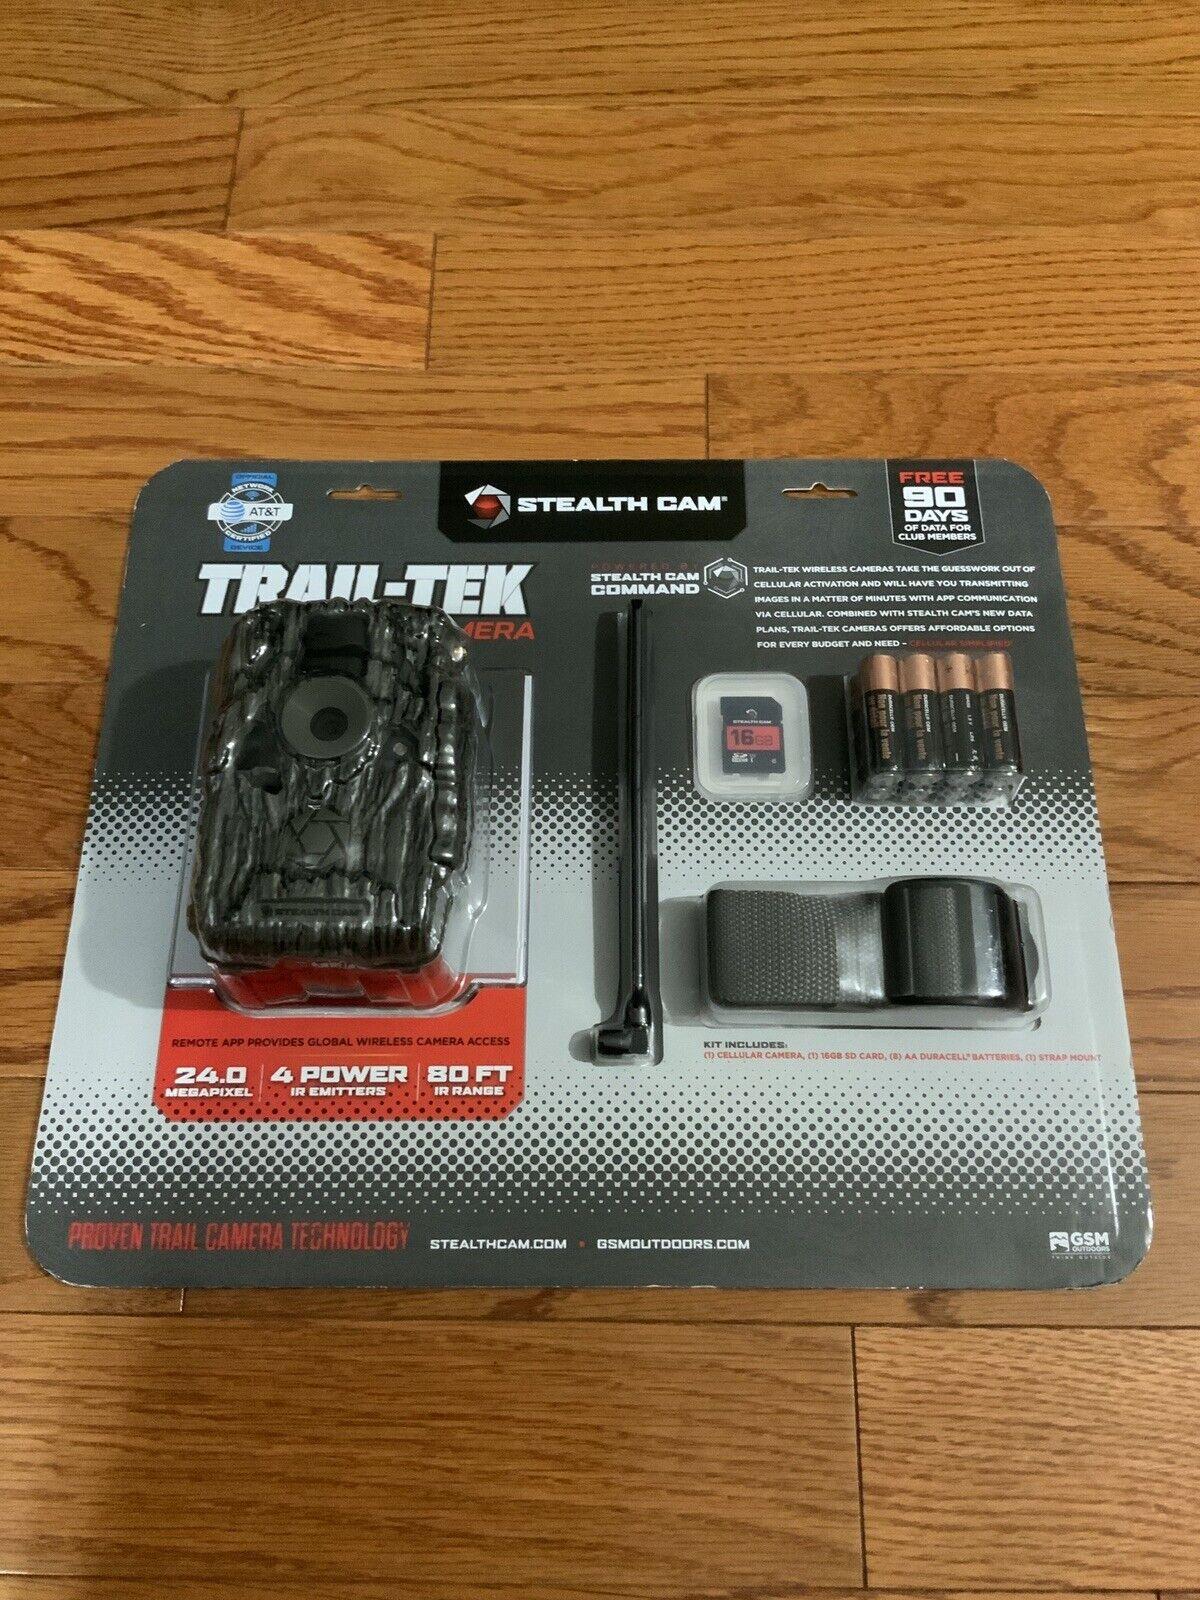 Free Shipping! Trail-Tek Cellular Camera 24 MP Stealth Cam STC-FVRZW V2